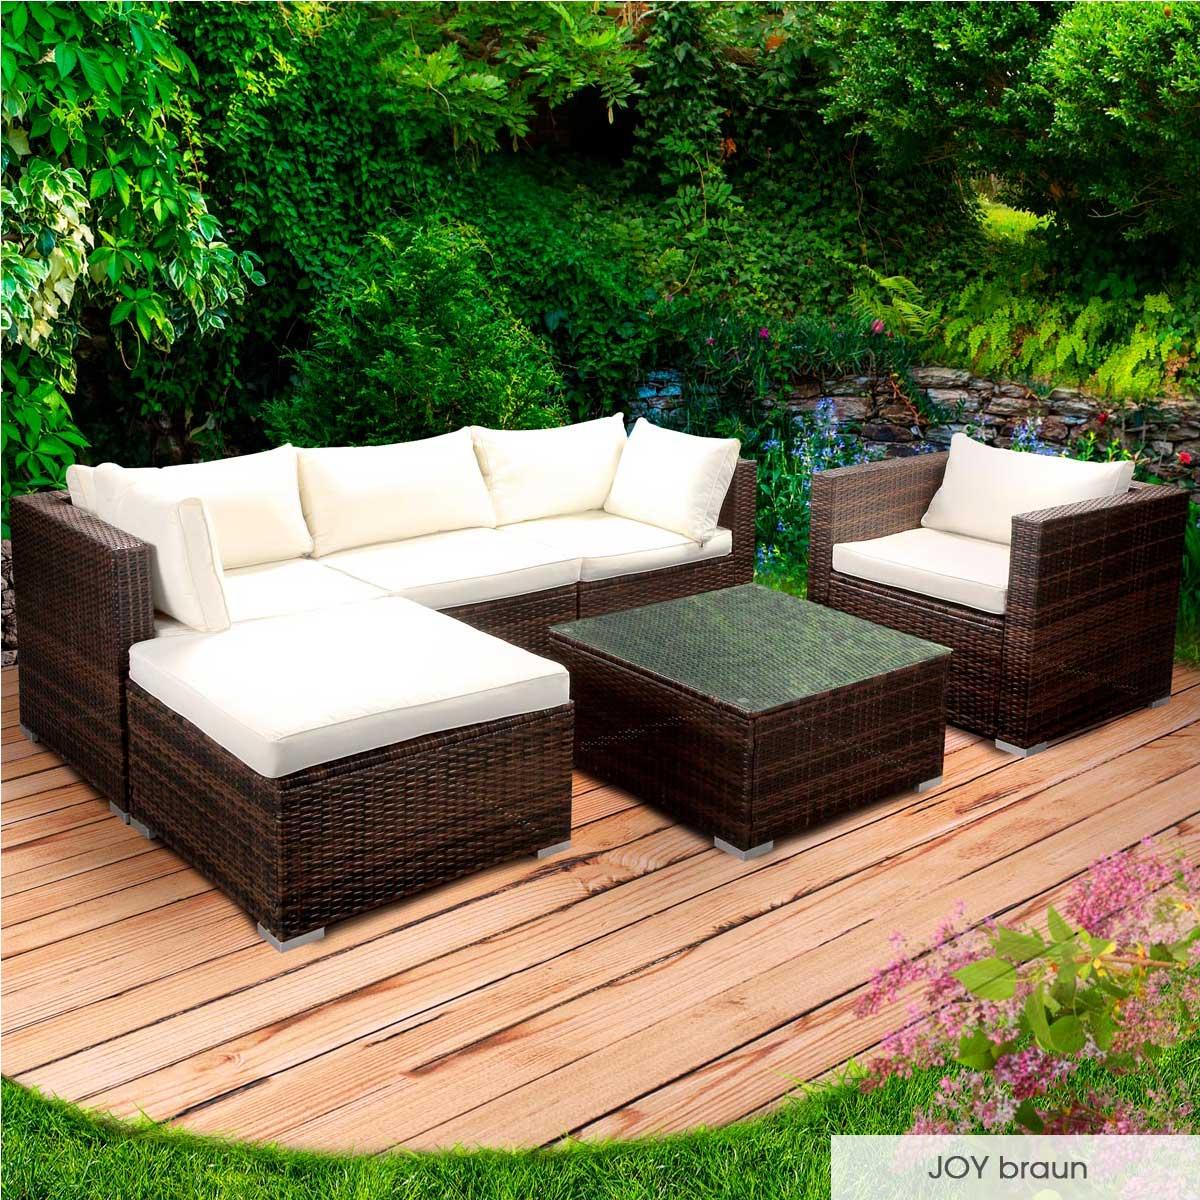 Gartenmoebel-Poly-Rattan-Lounge-Moebel-Sitzgarnitur-Gartengarnitur-Sitzgruppe-Sofa Indexbild 22